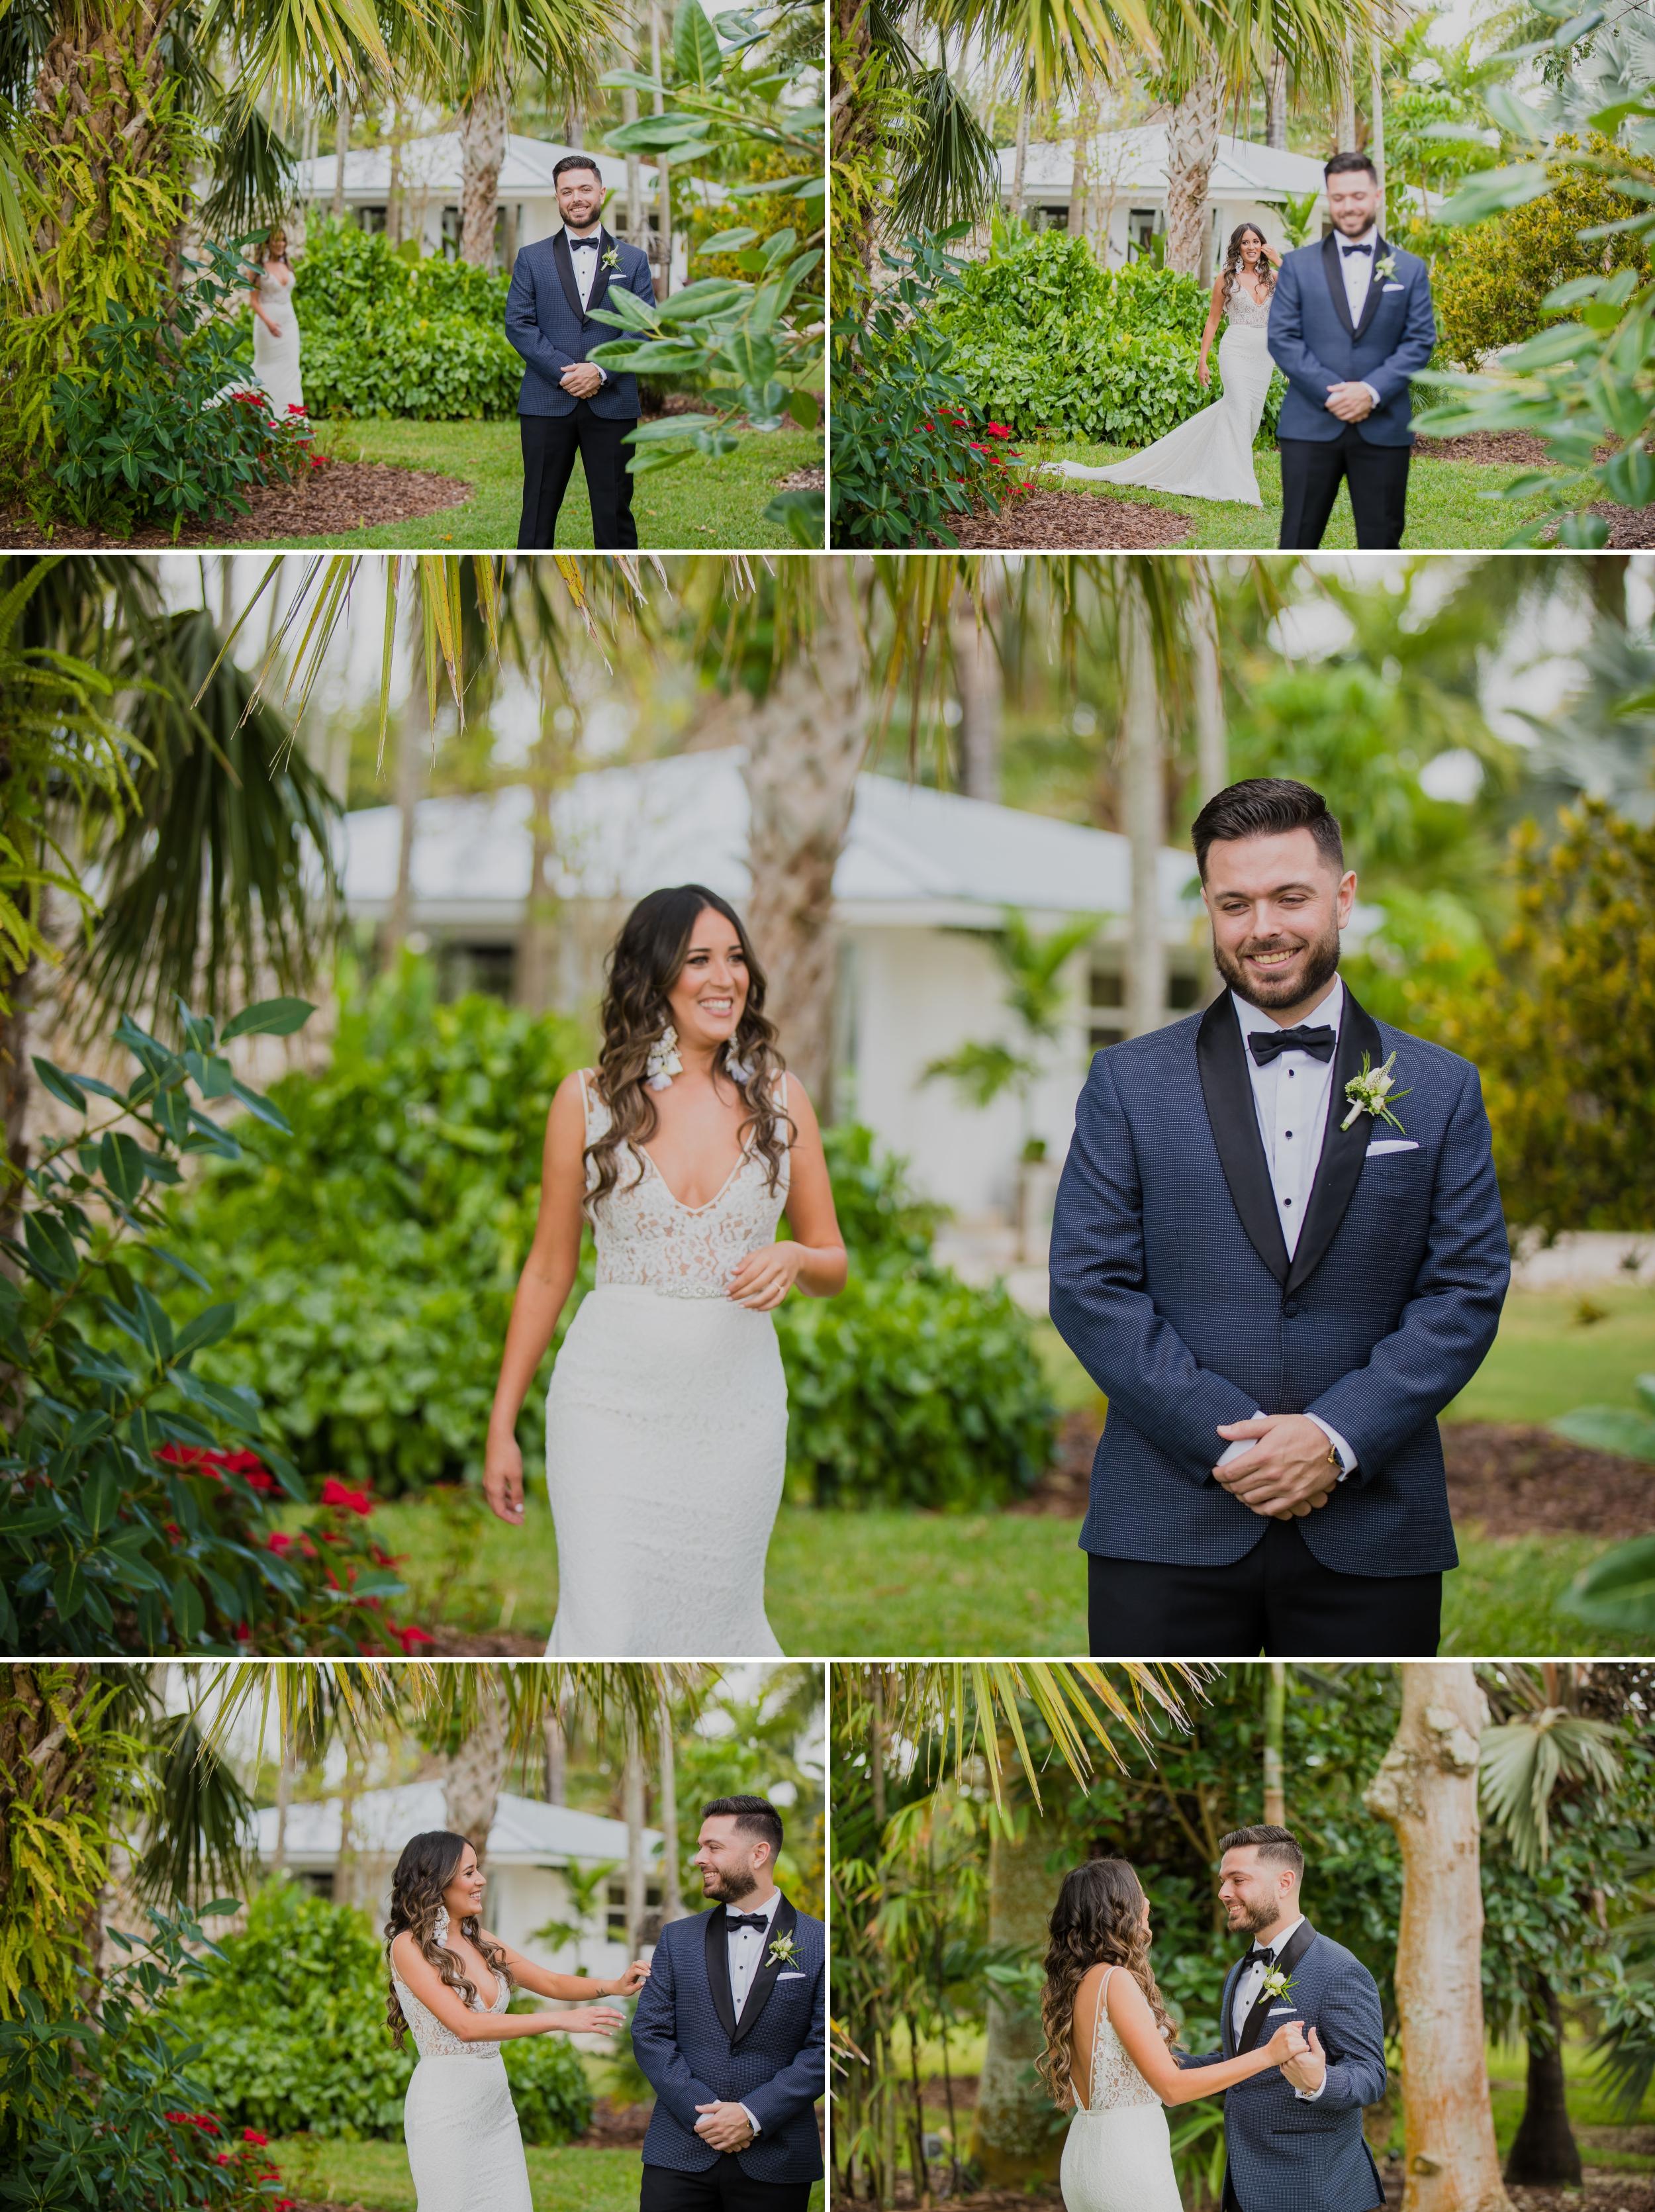 Wedding Whimsical Key West House  - Photography by Santy Martinez 5.jpg